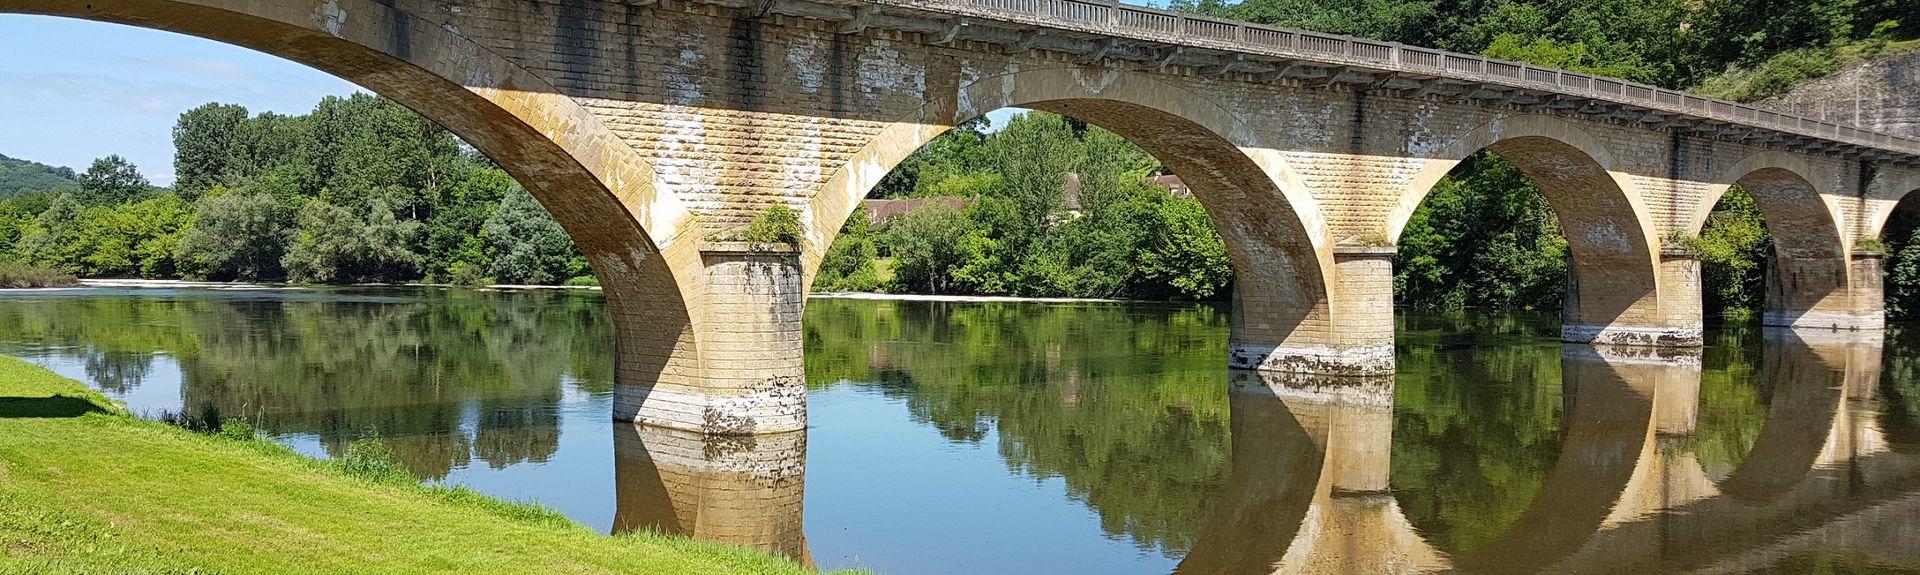 Pressignac-Vicq, Dordogne, France